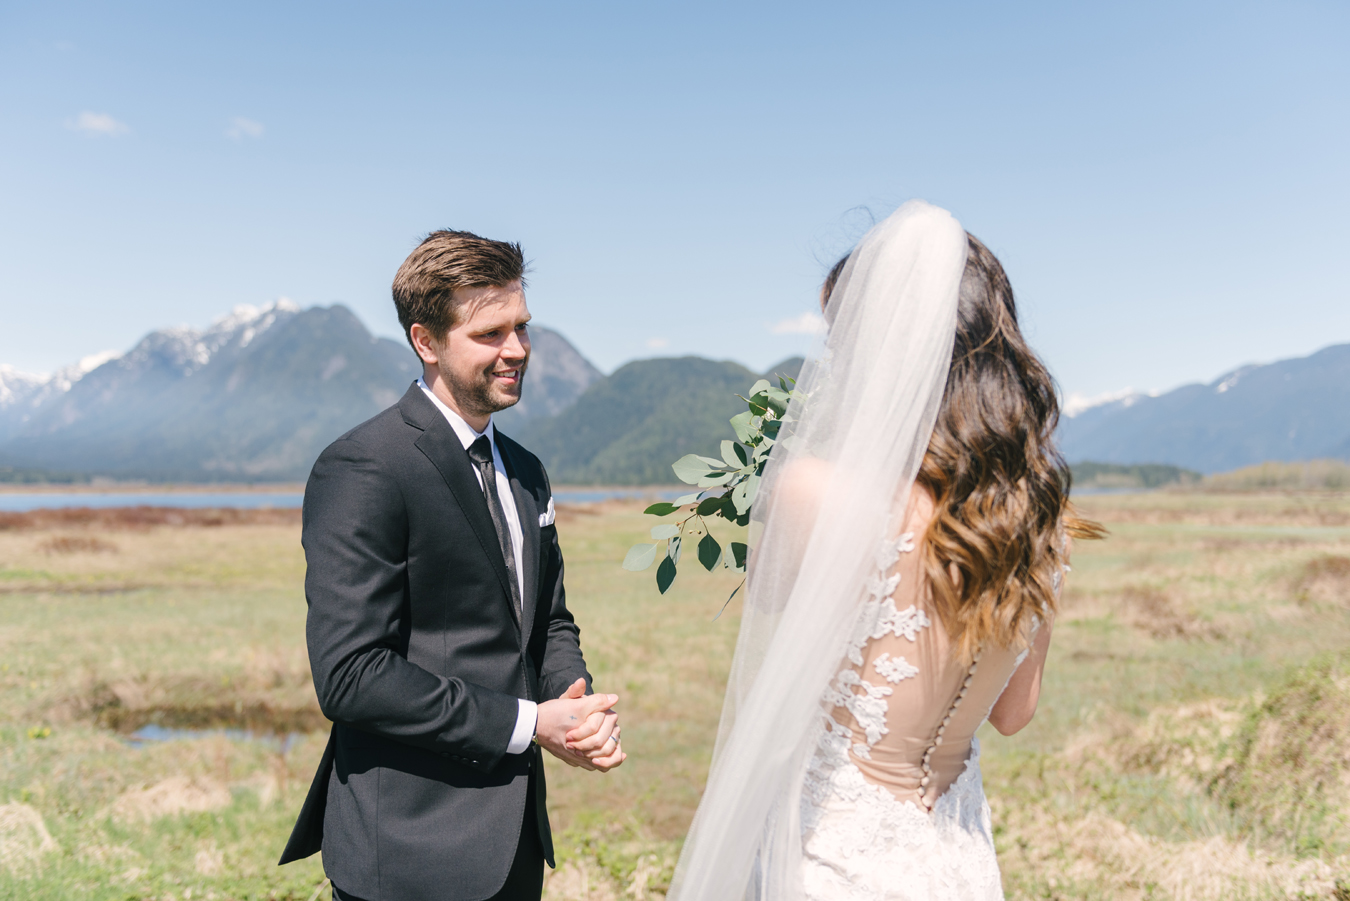 vanouver-wedding-portraits-10.jpg